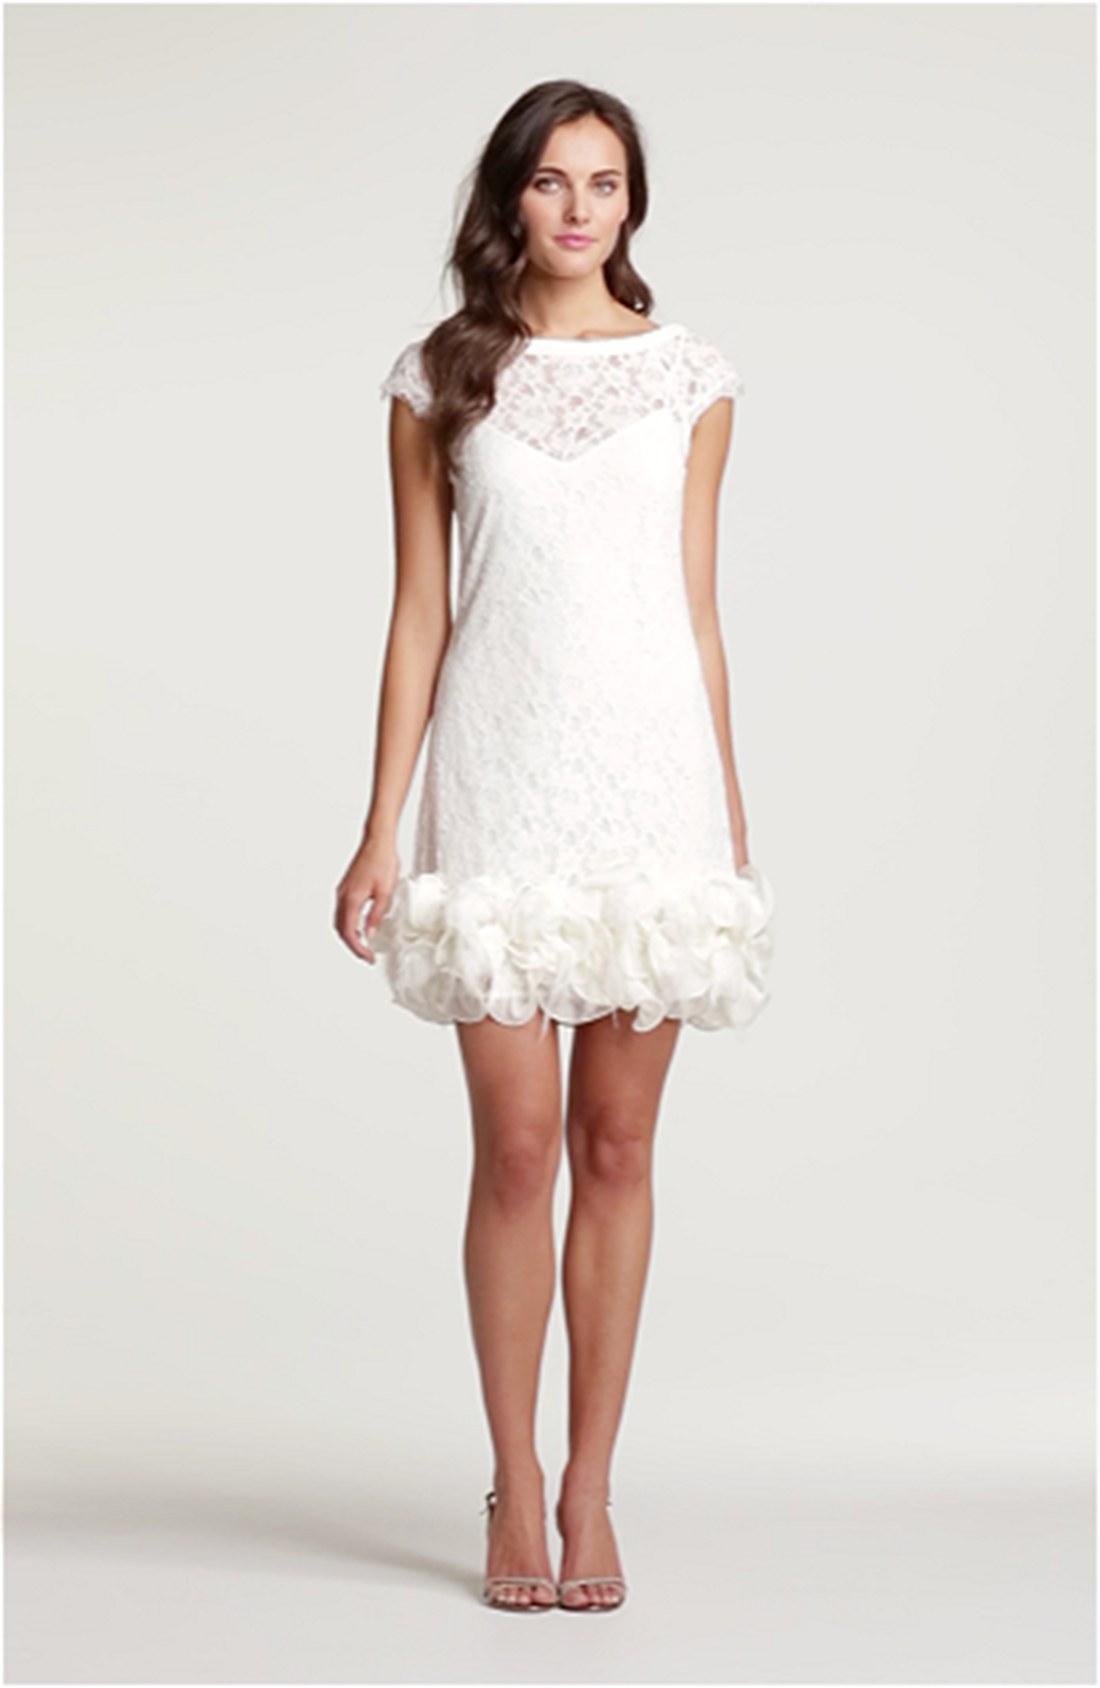 White feather trim dress.